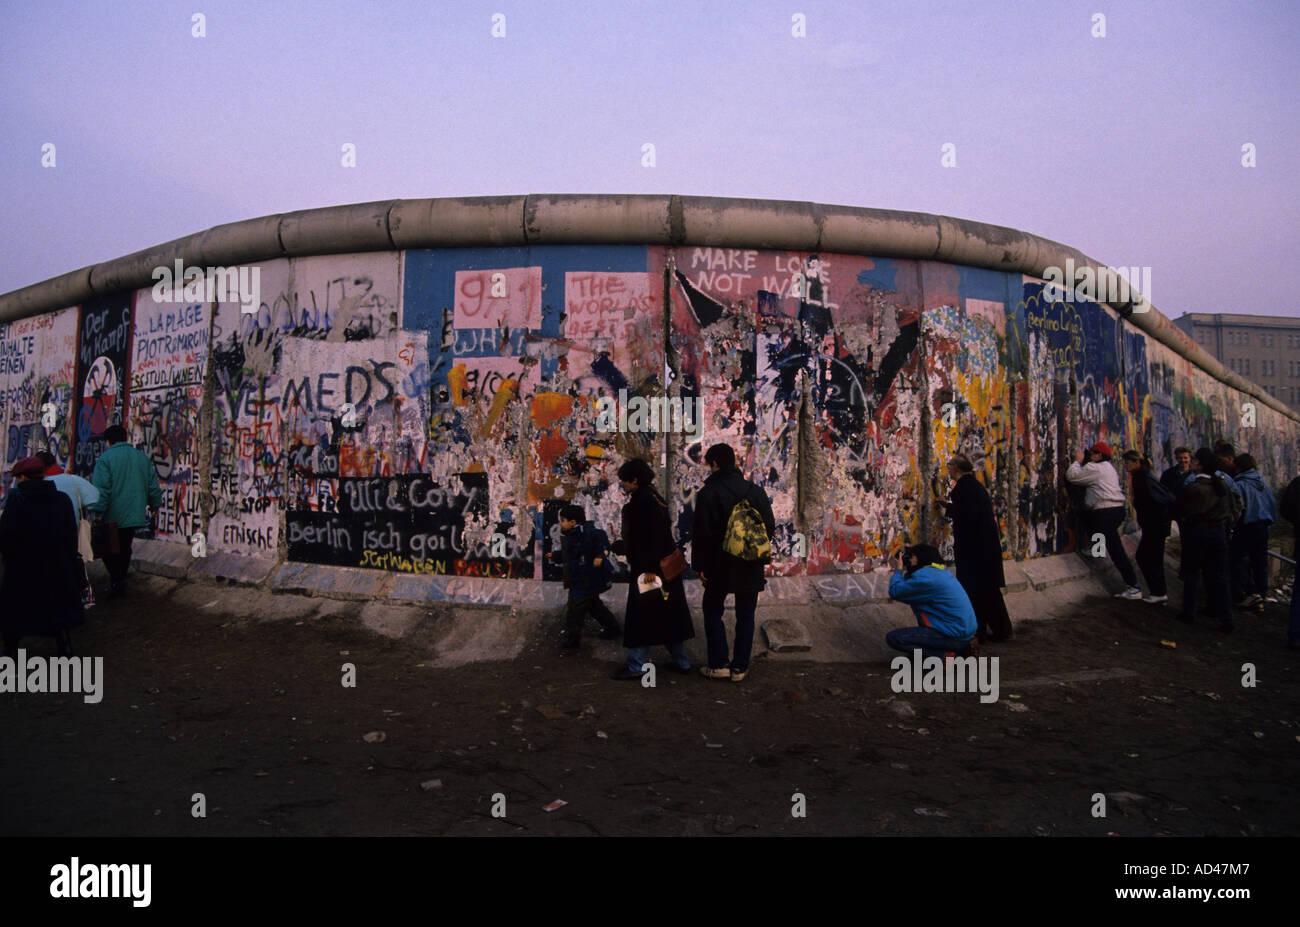 berlin wall fall 1989 communism symbol - Stock Image